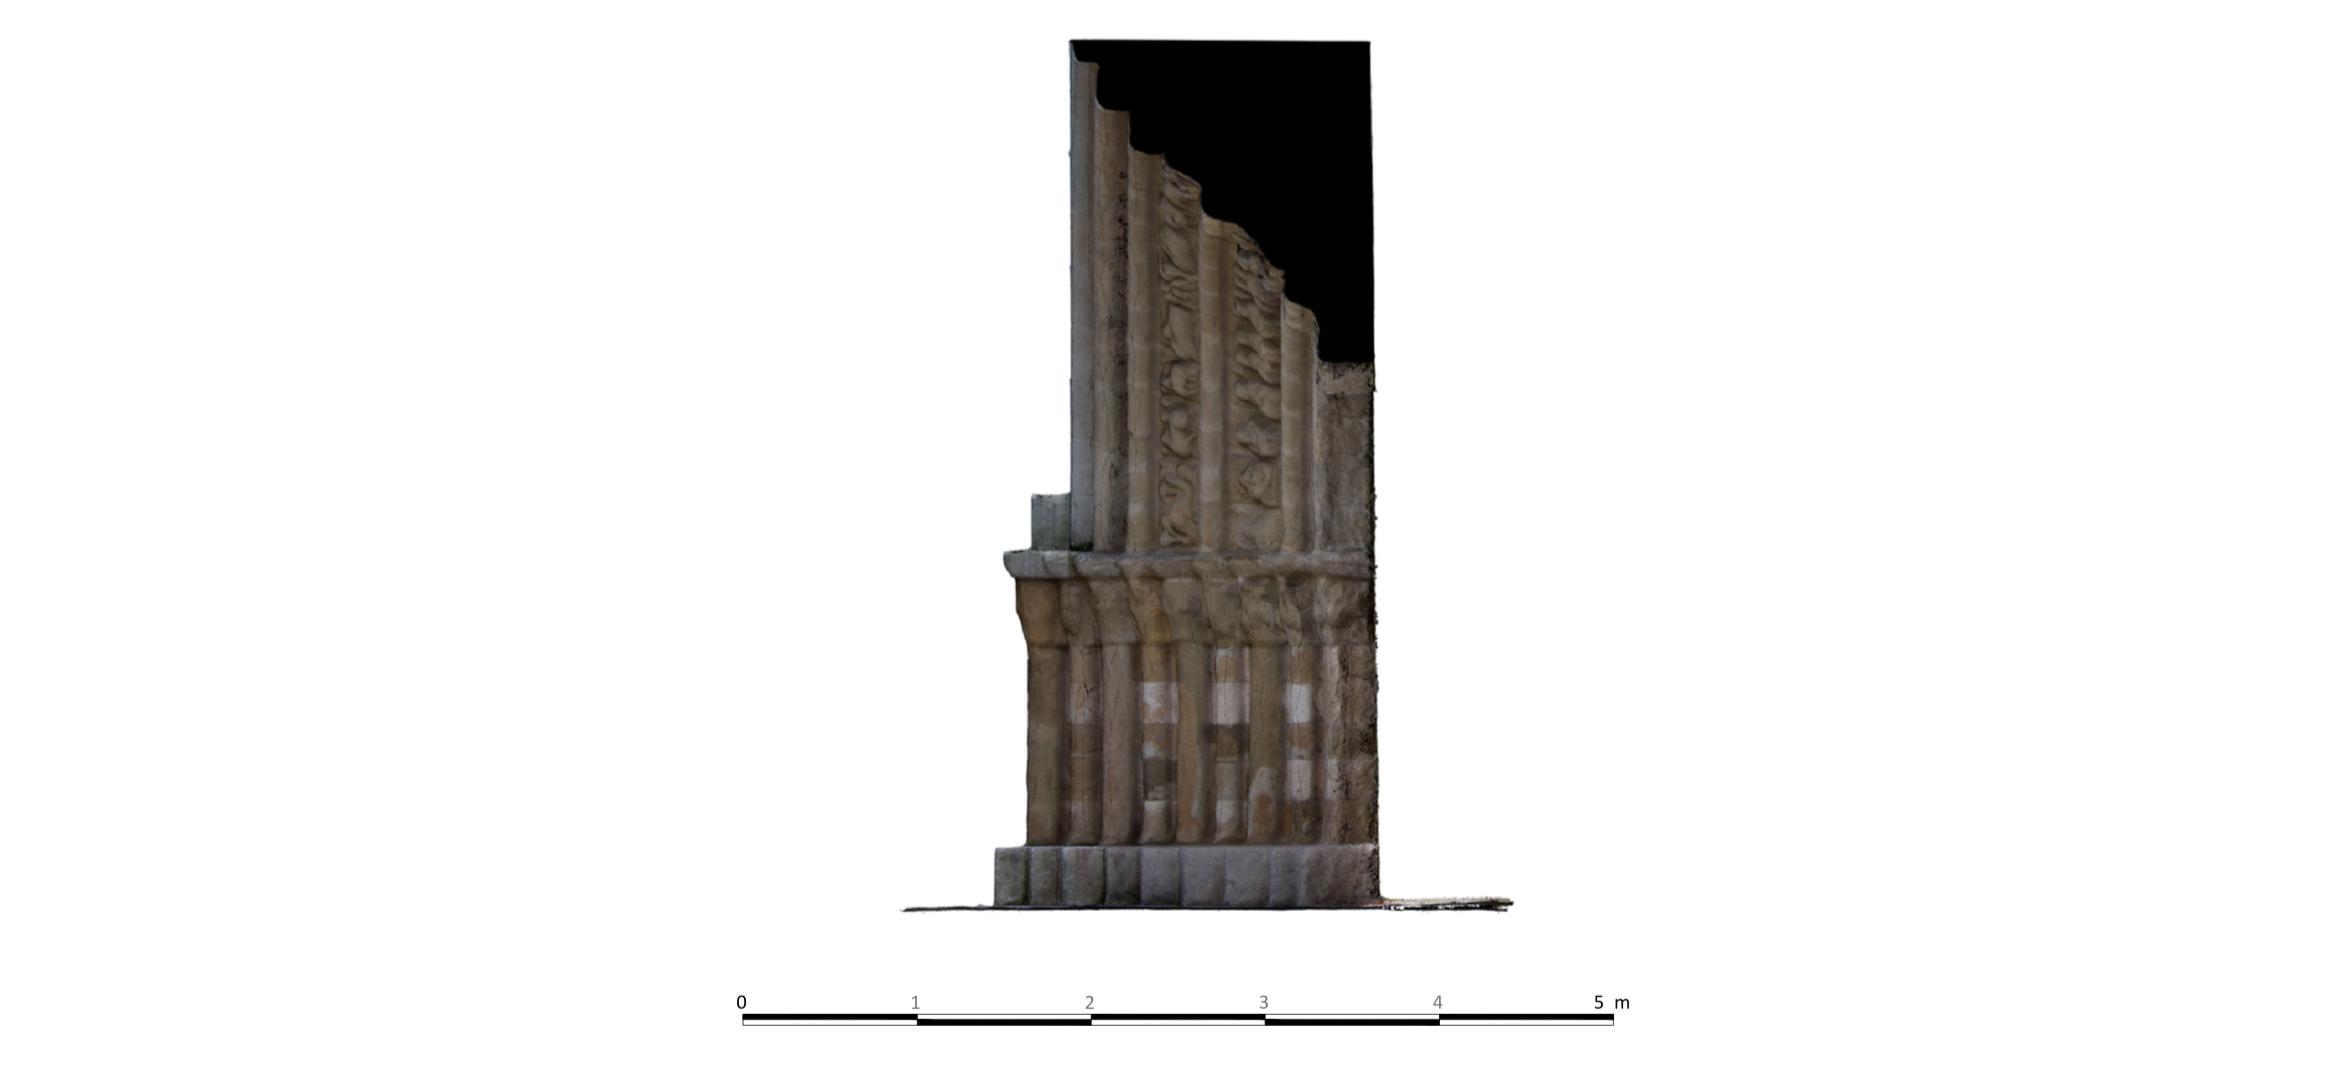 Sección vertical